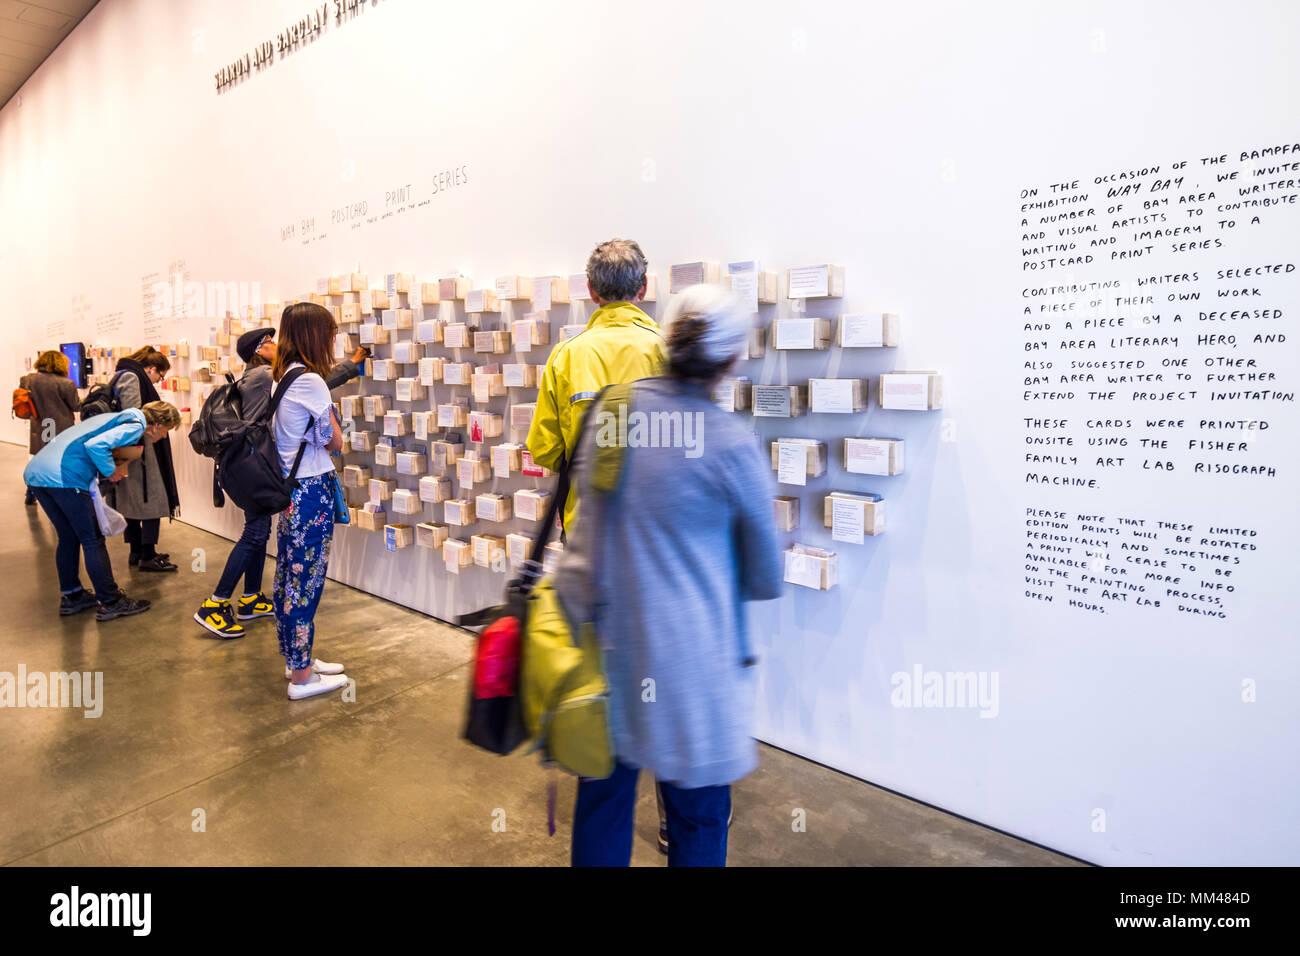 Wall of free postcards at  the UC Berkeley Art Museum, Berkeley, CA, USA. - Stock Image